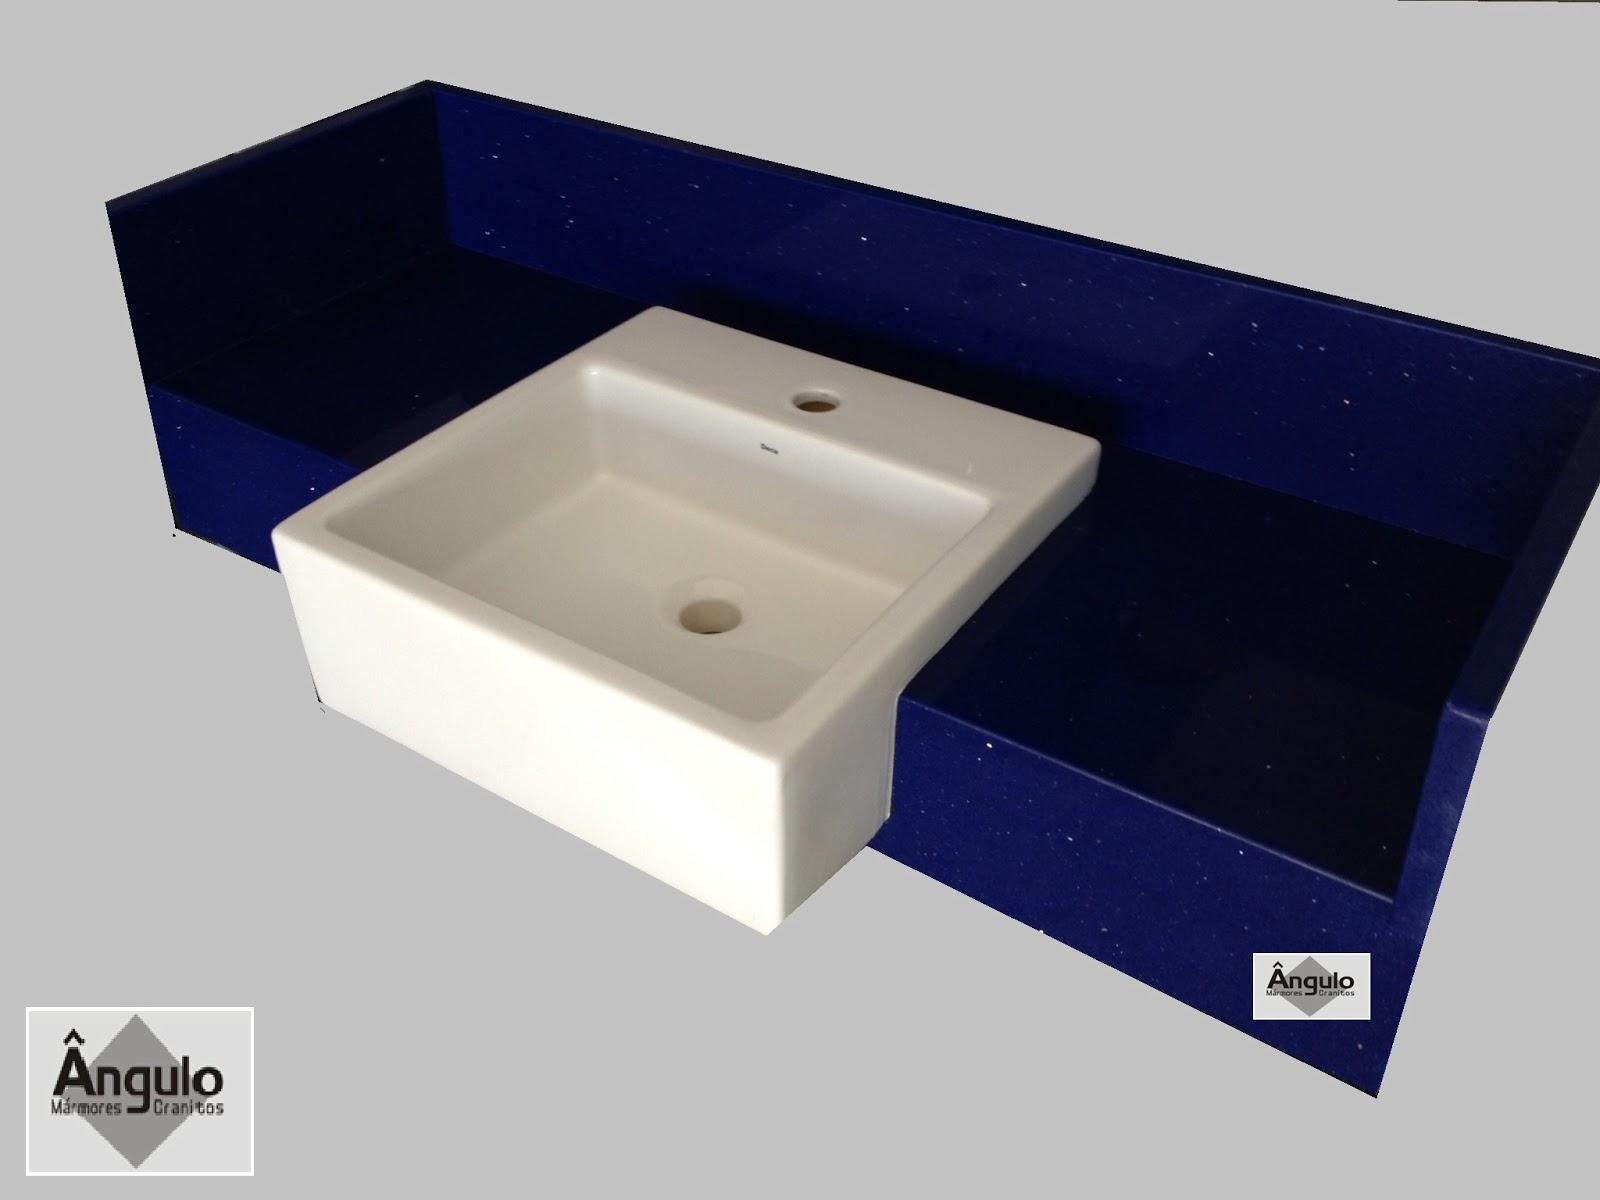 Ângulo Mármores e Granitos: Silestone Azul Stellar #080B2B 1600x1200 Bancada Banheiro Azul